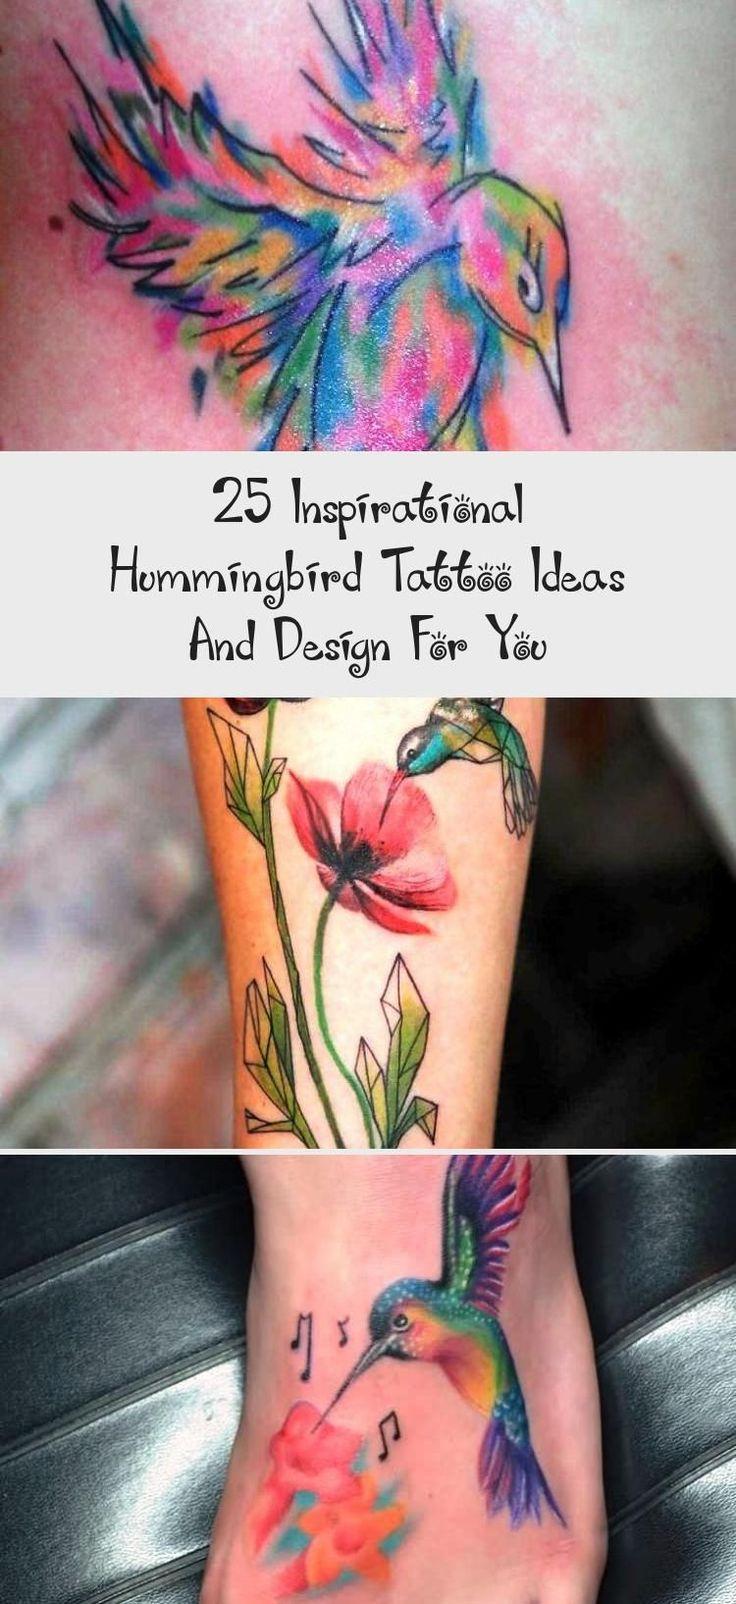 25 Inspirational Hummingbird Tattoo Ideas And Design For